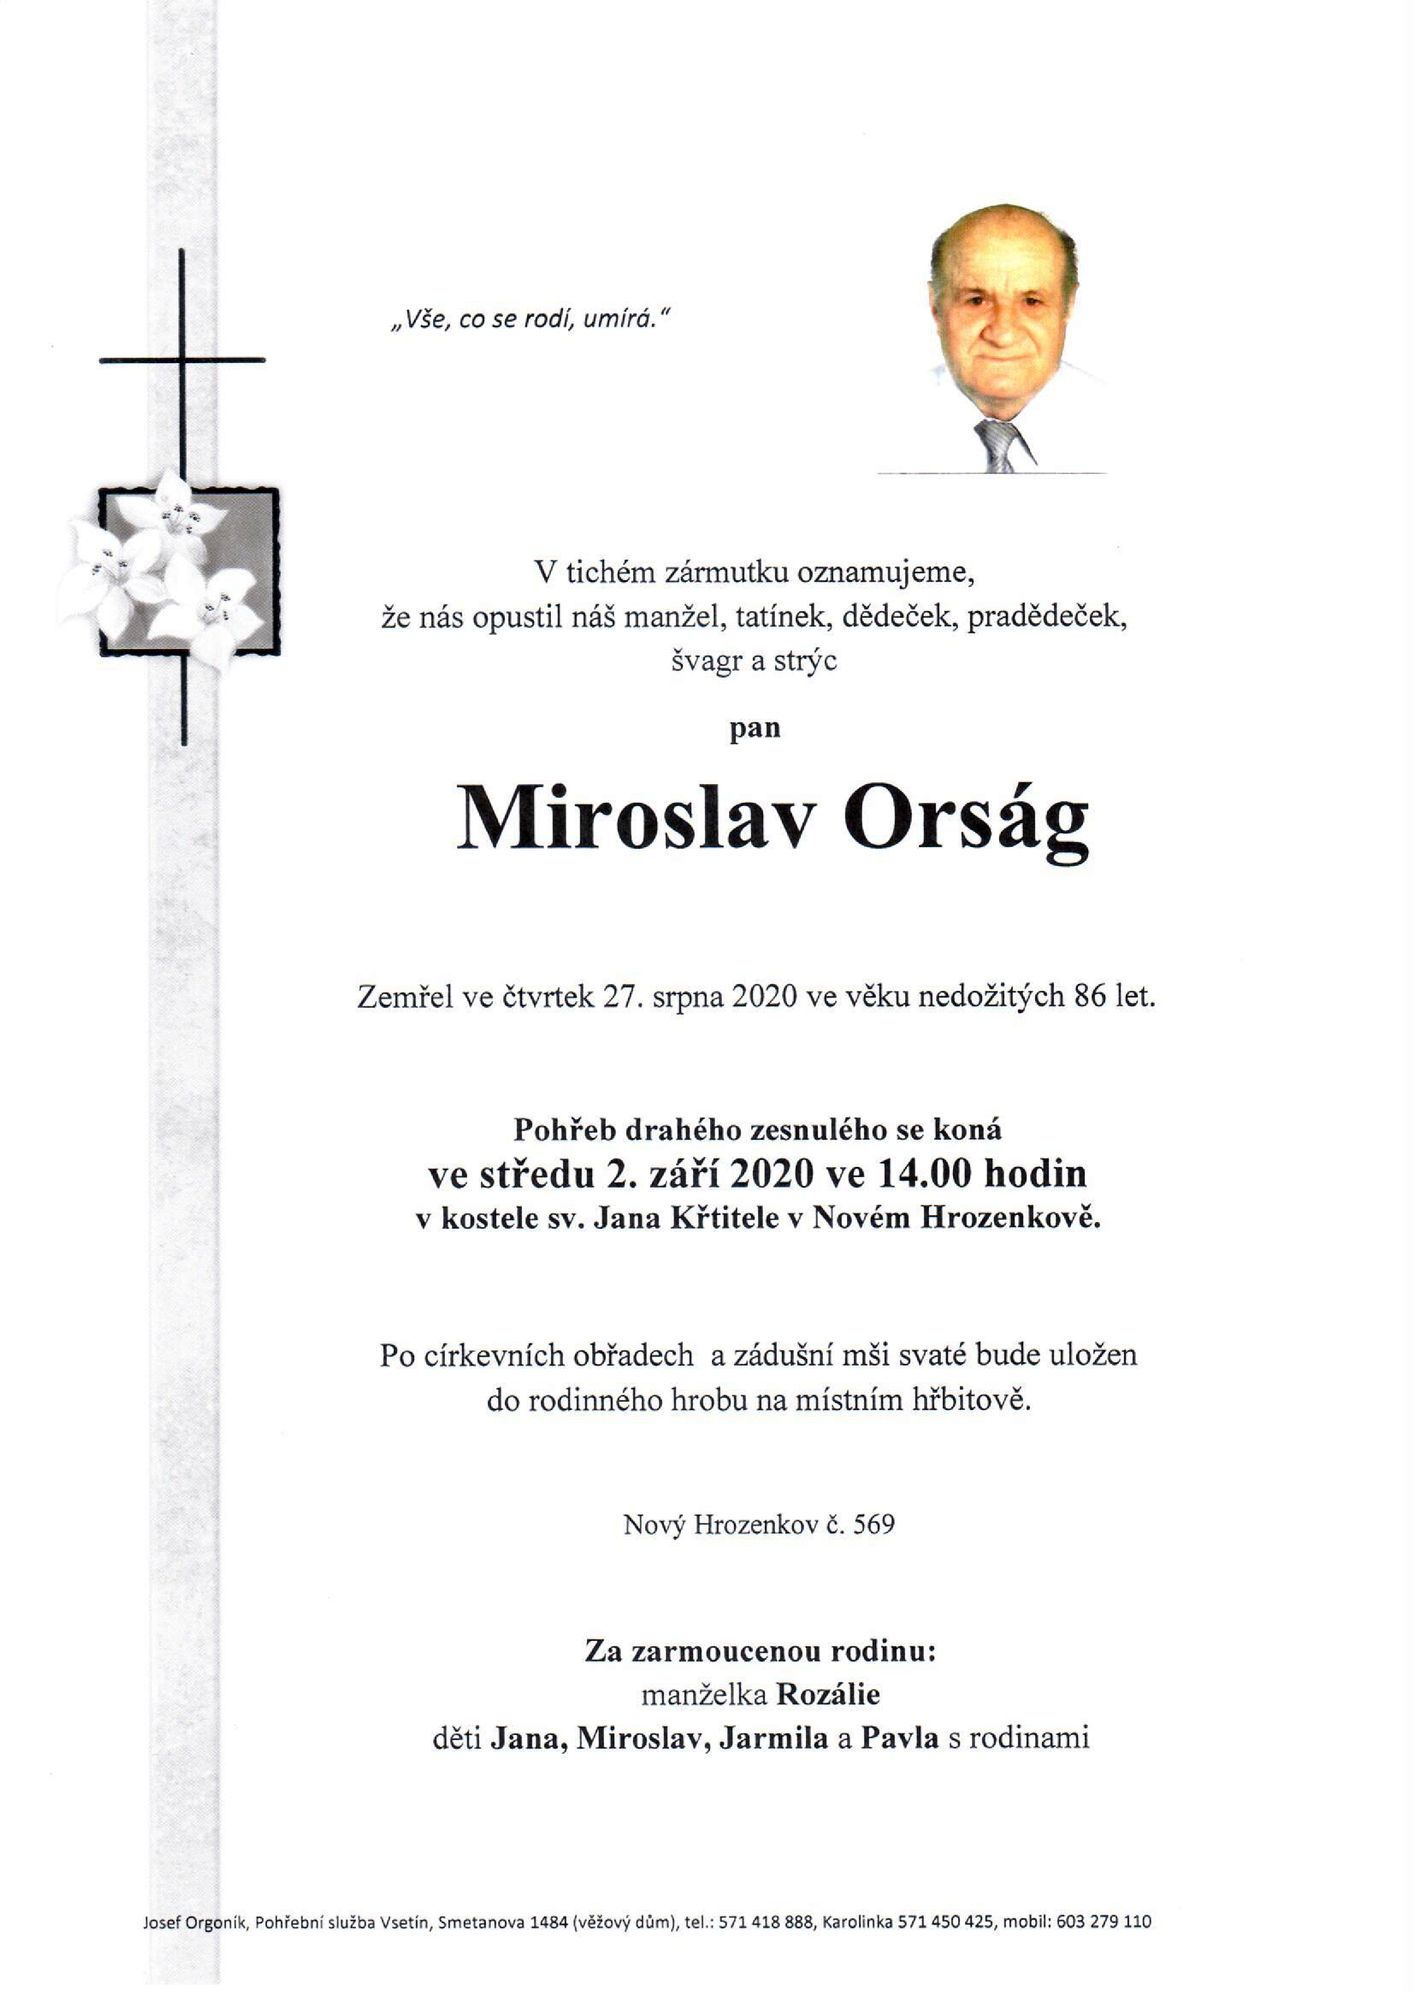 Miroslav Orság